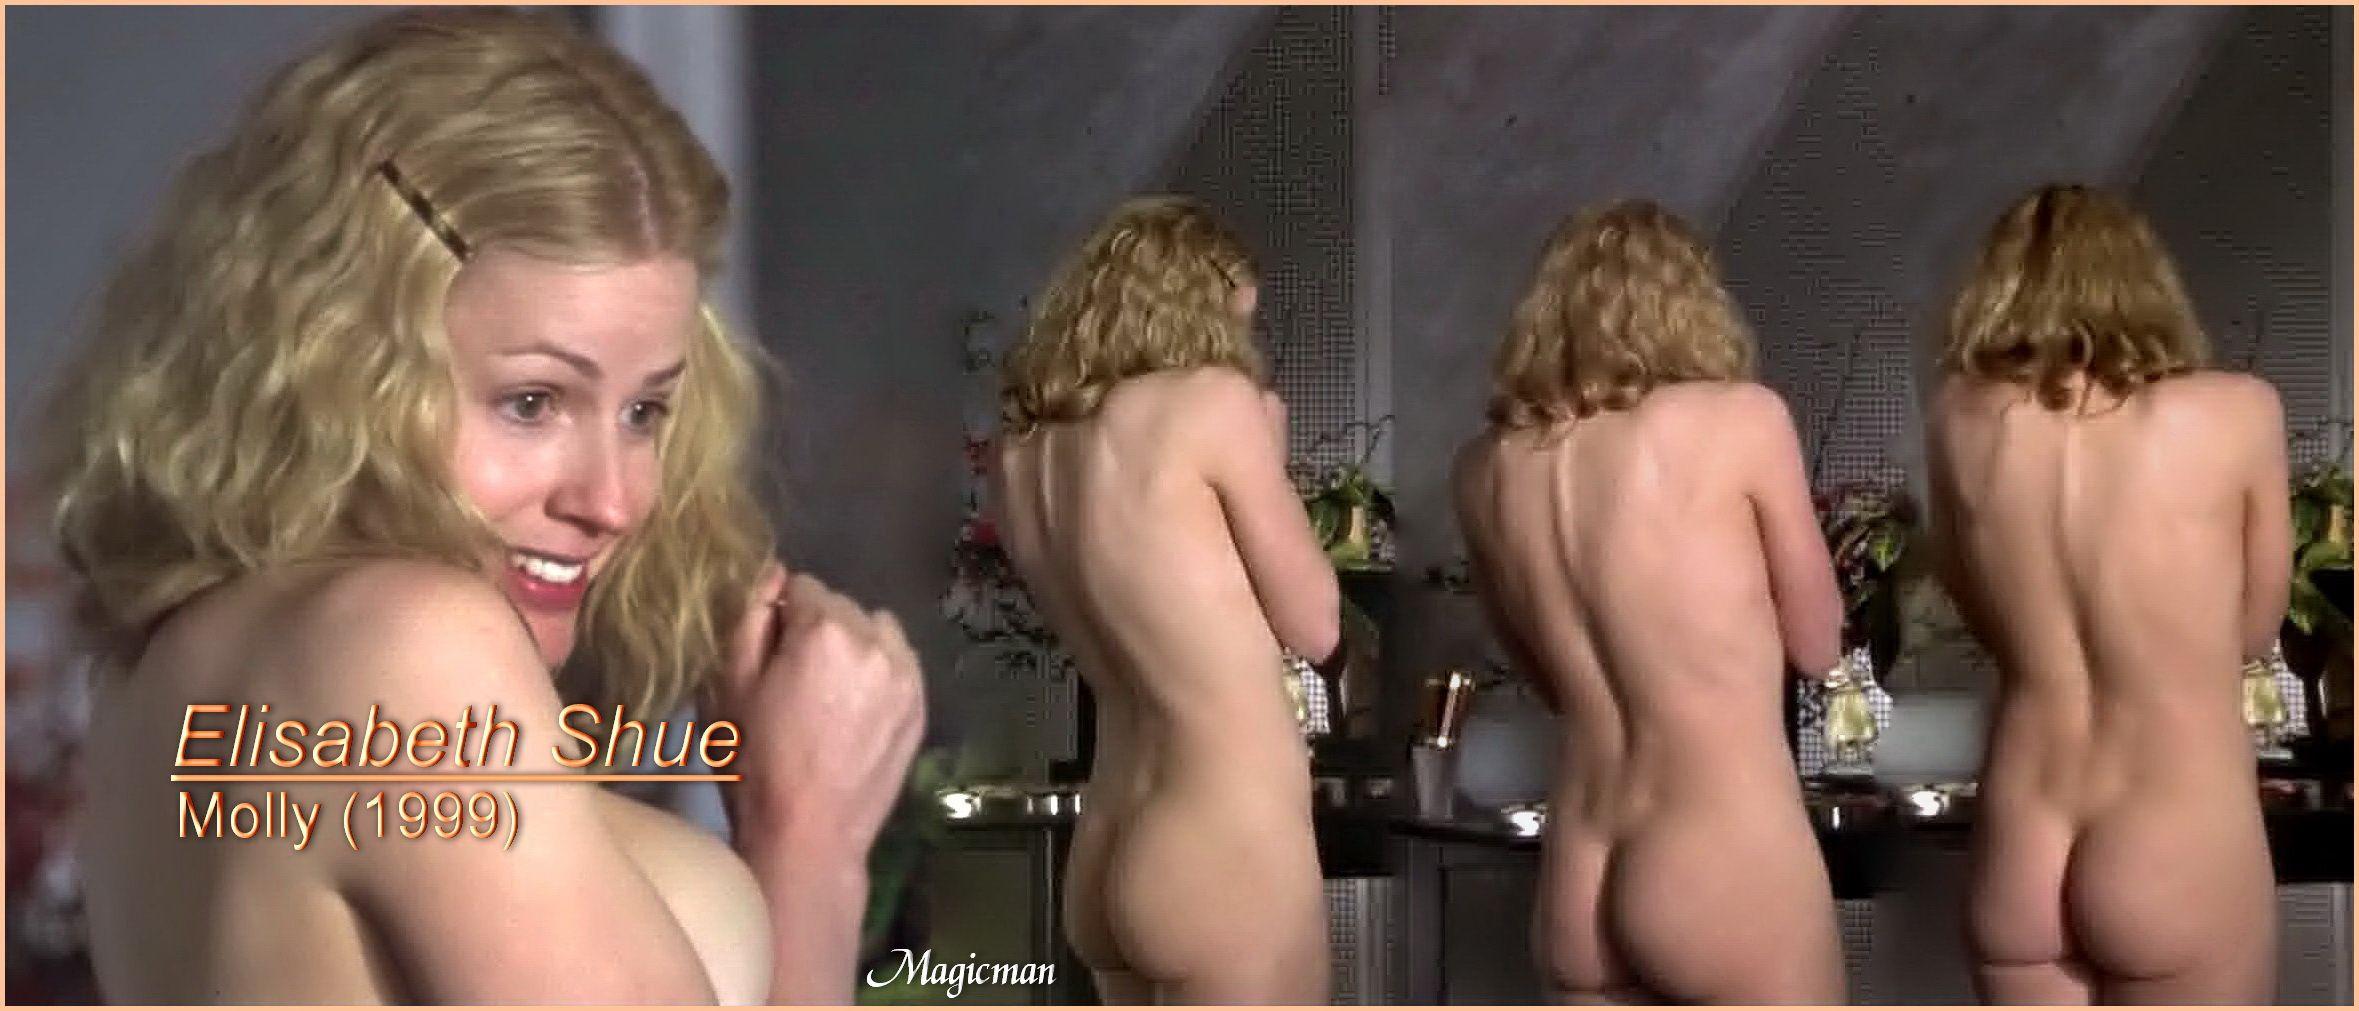 Elizabeth shue hot and nude pics-7723